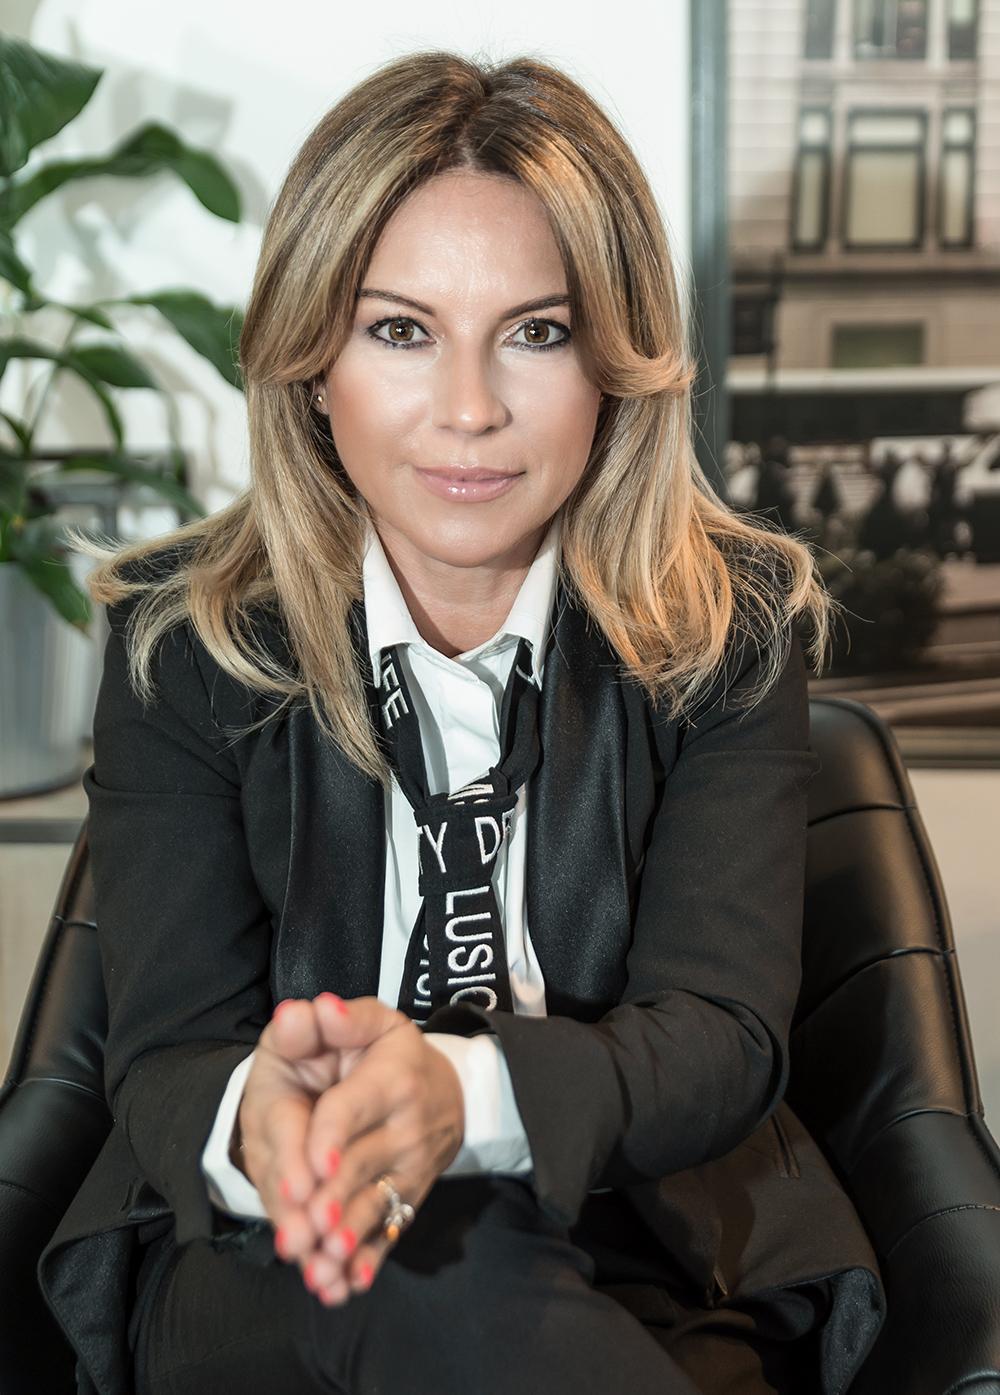 Mihaela Vasilica Bura